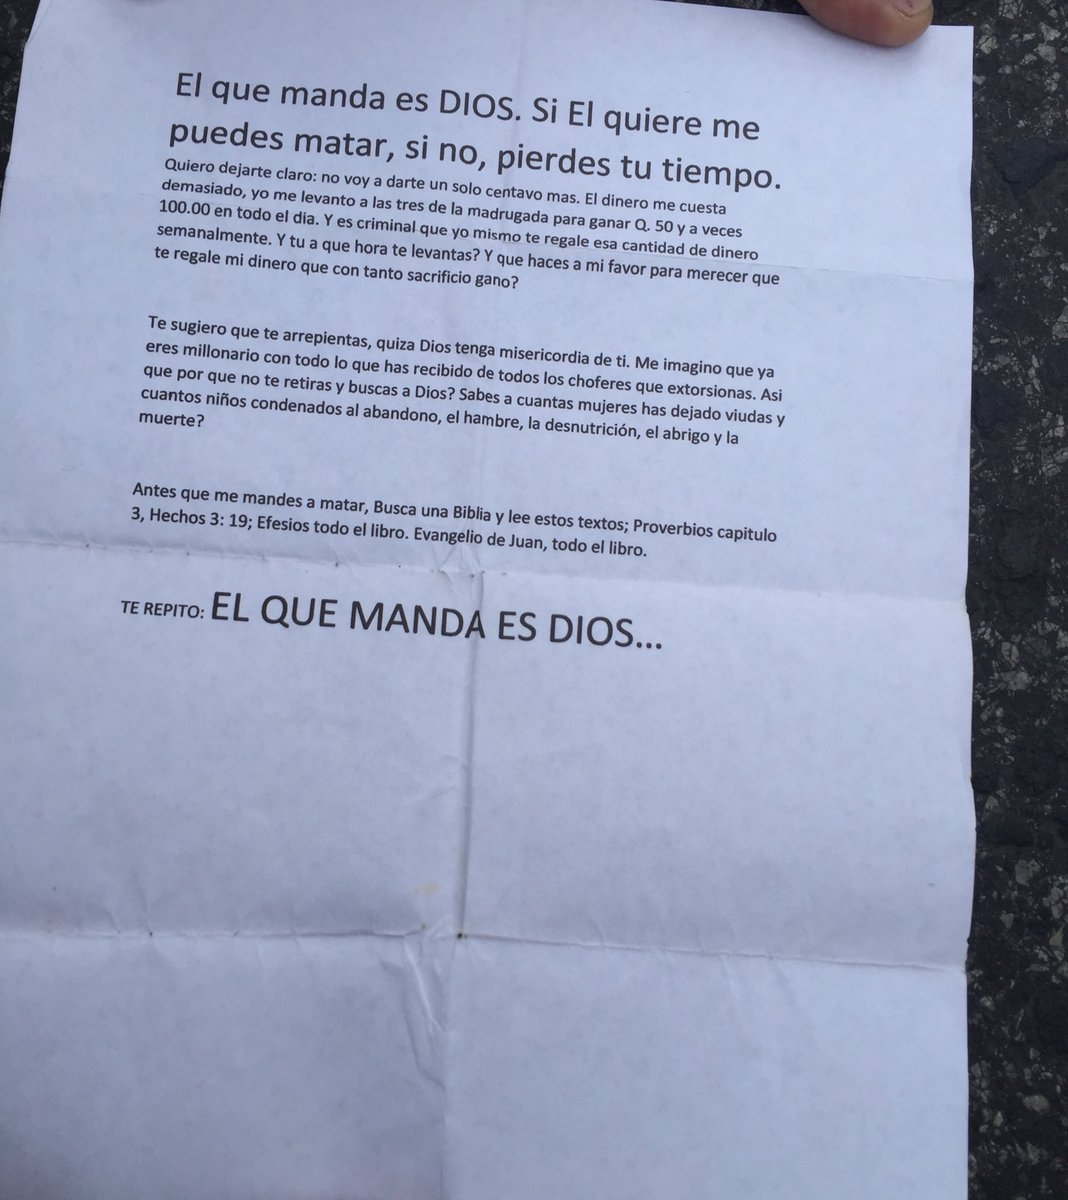 Dos copias de esta carta tenía Mario López piloto de bus asesinado a balazos. Estaba en su dormitorio https://t.co/Hgmzg8ipq1